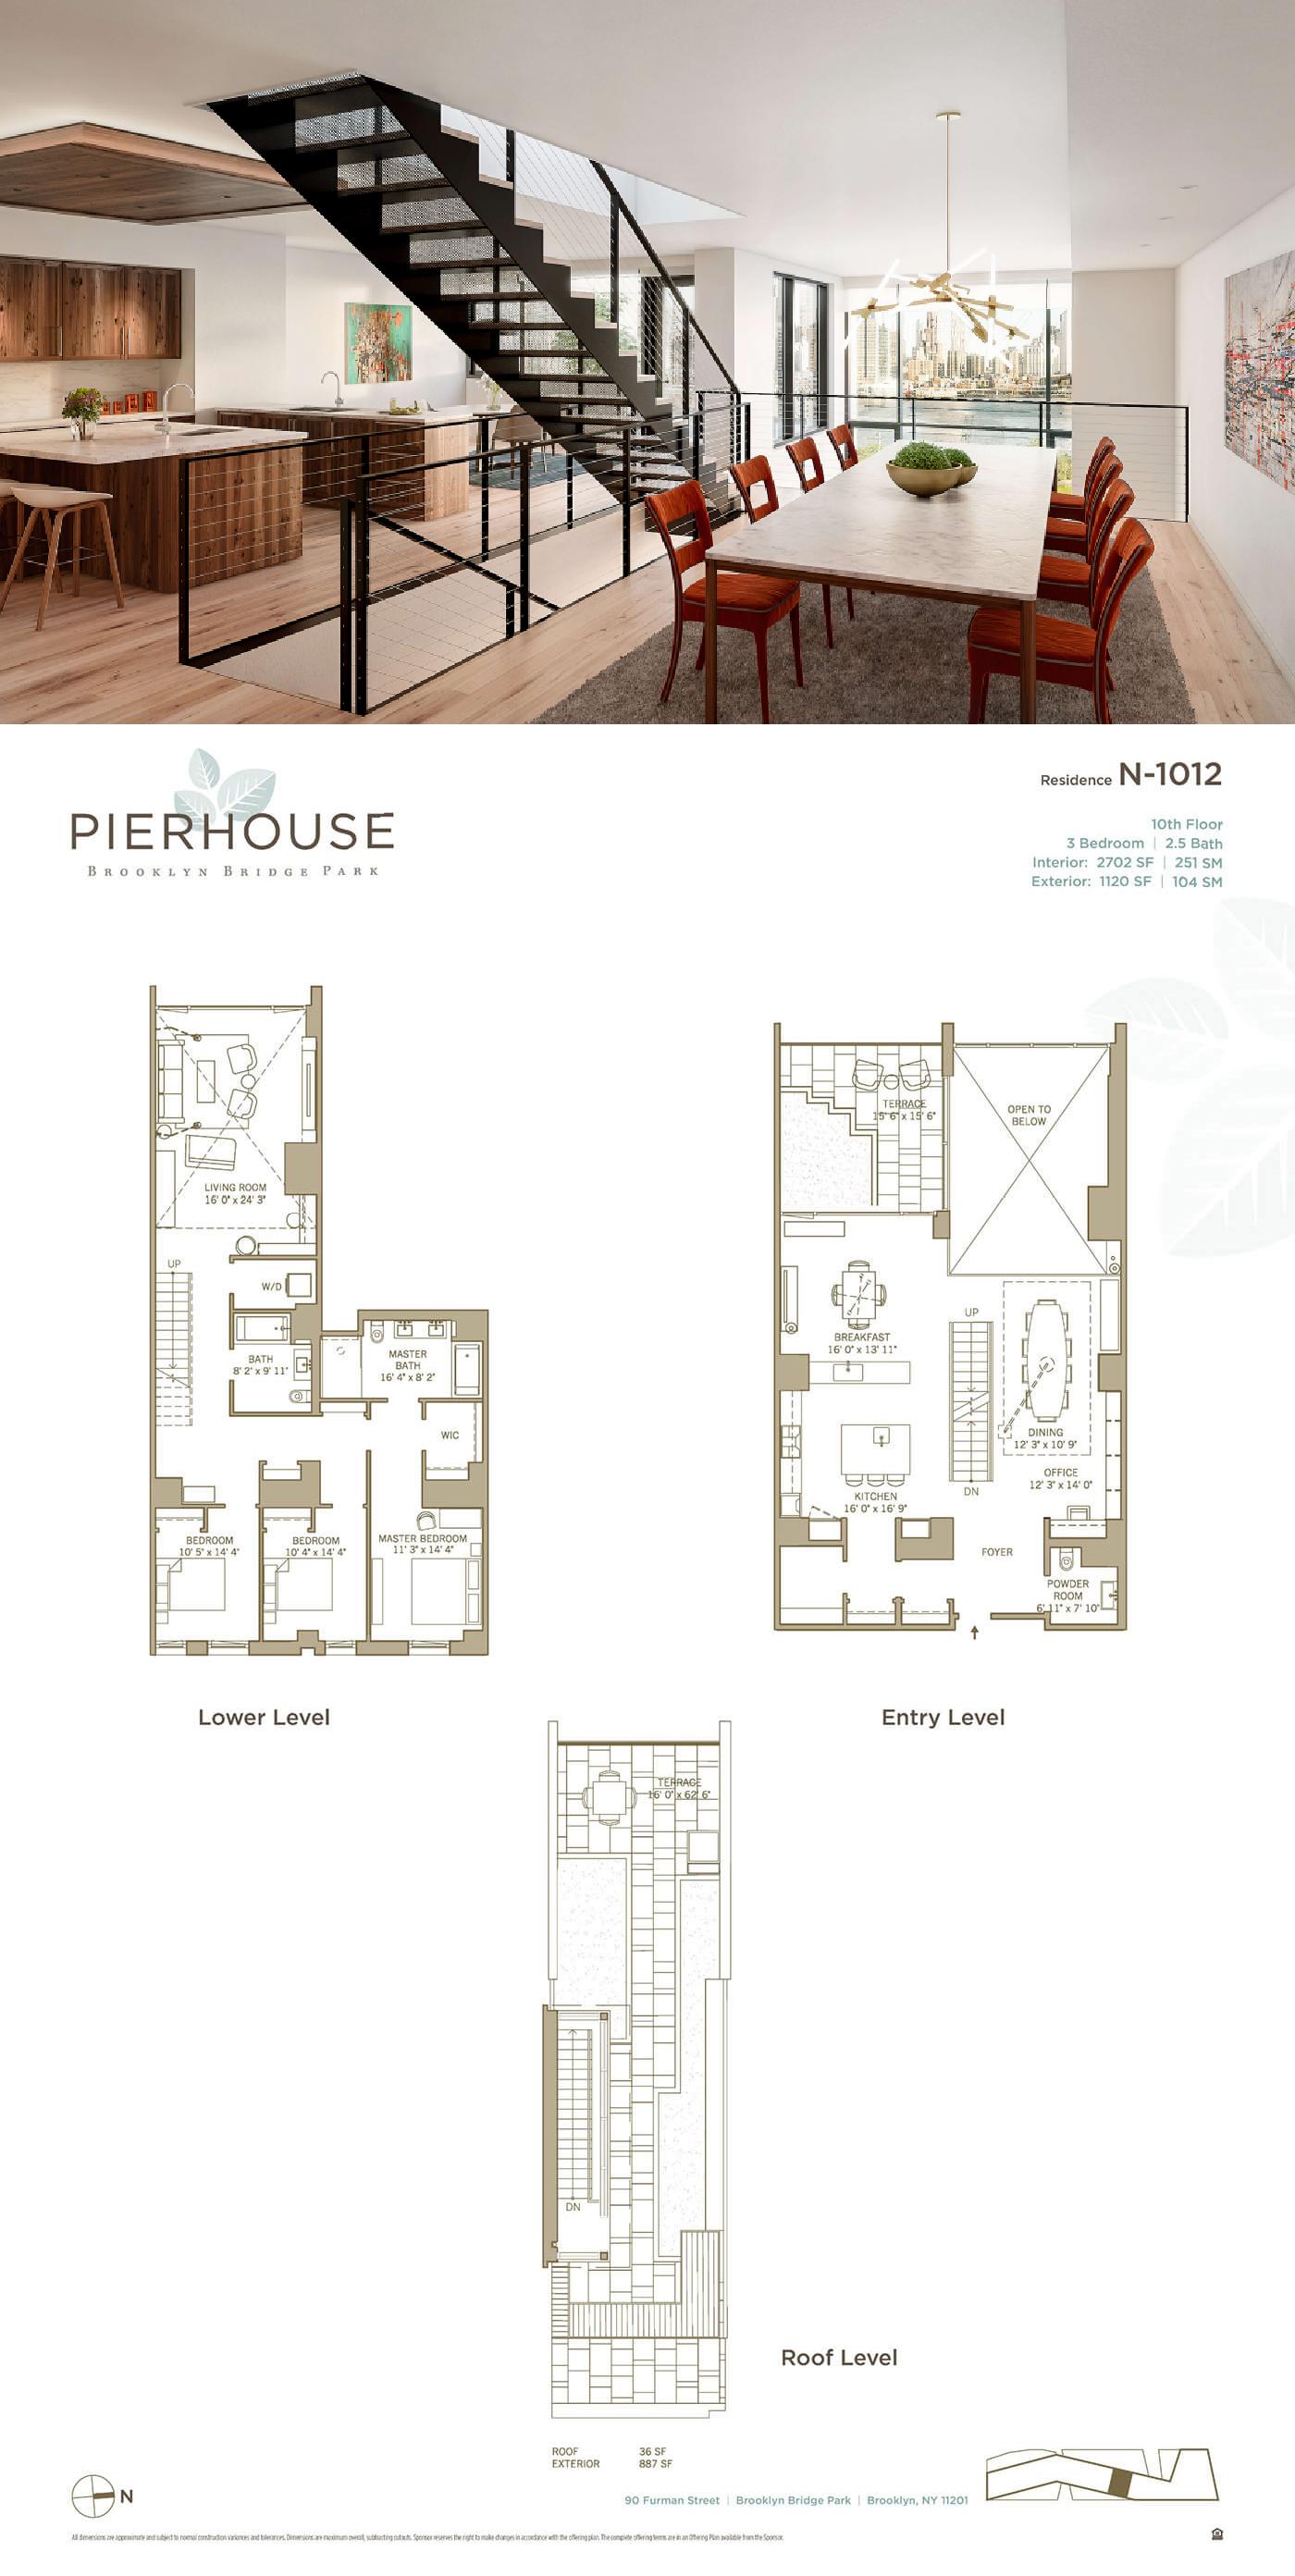 Pierhouse Brooklyn Luxury Condos For Sale At Brooklyn Bridge Park Penthouse Apartment Floor Plan Pier House City Living Apartment